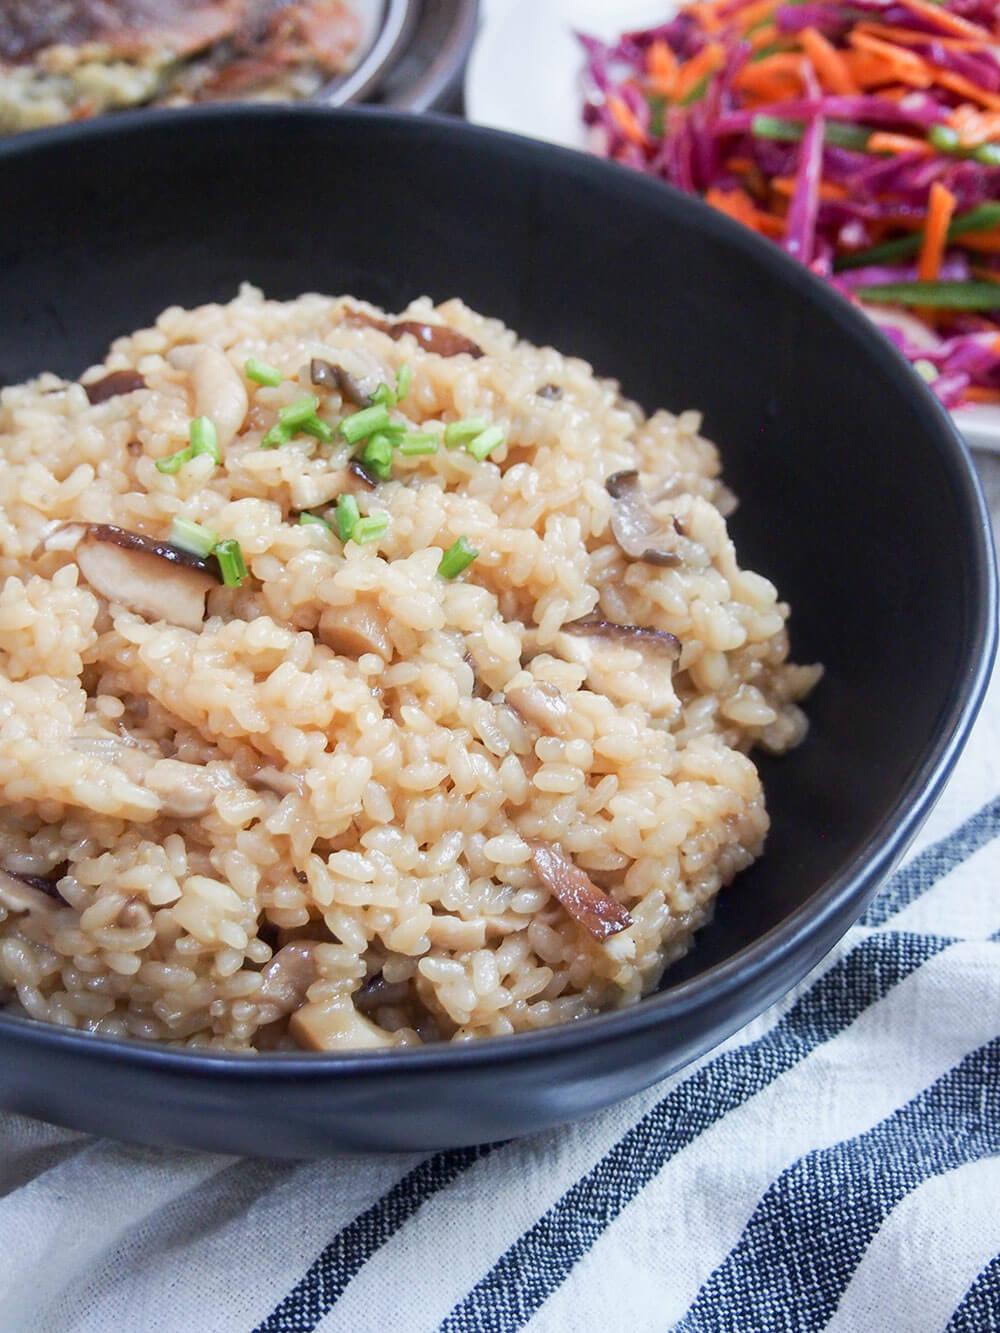 Japanese mushroom rice kinoko gohan, with other dishes behind